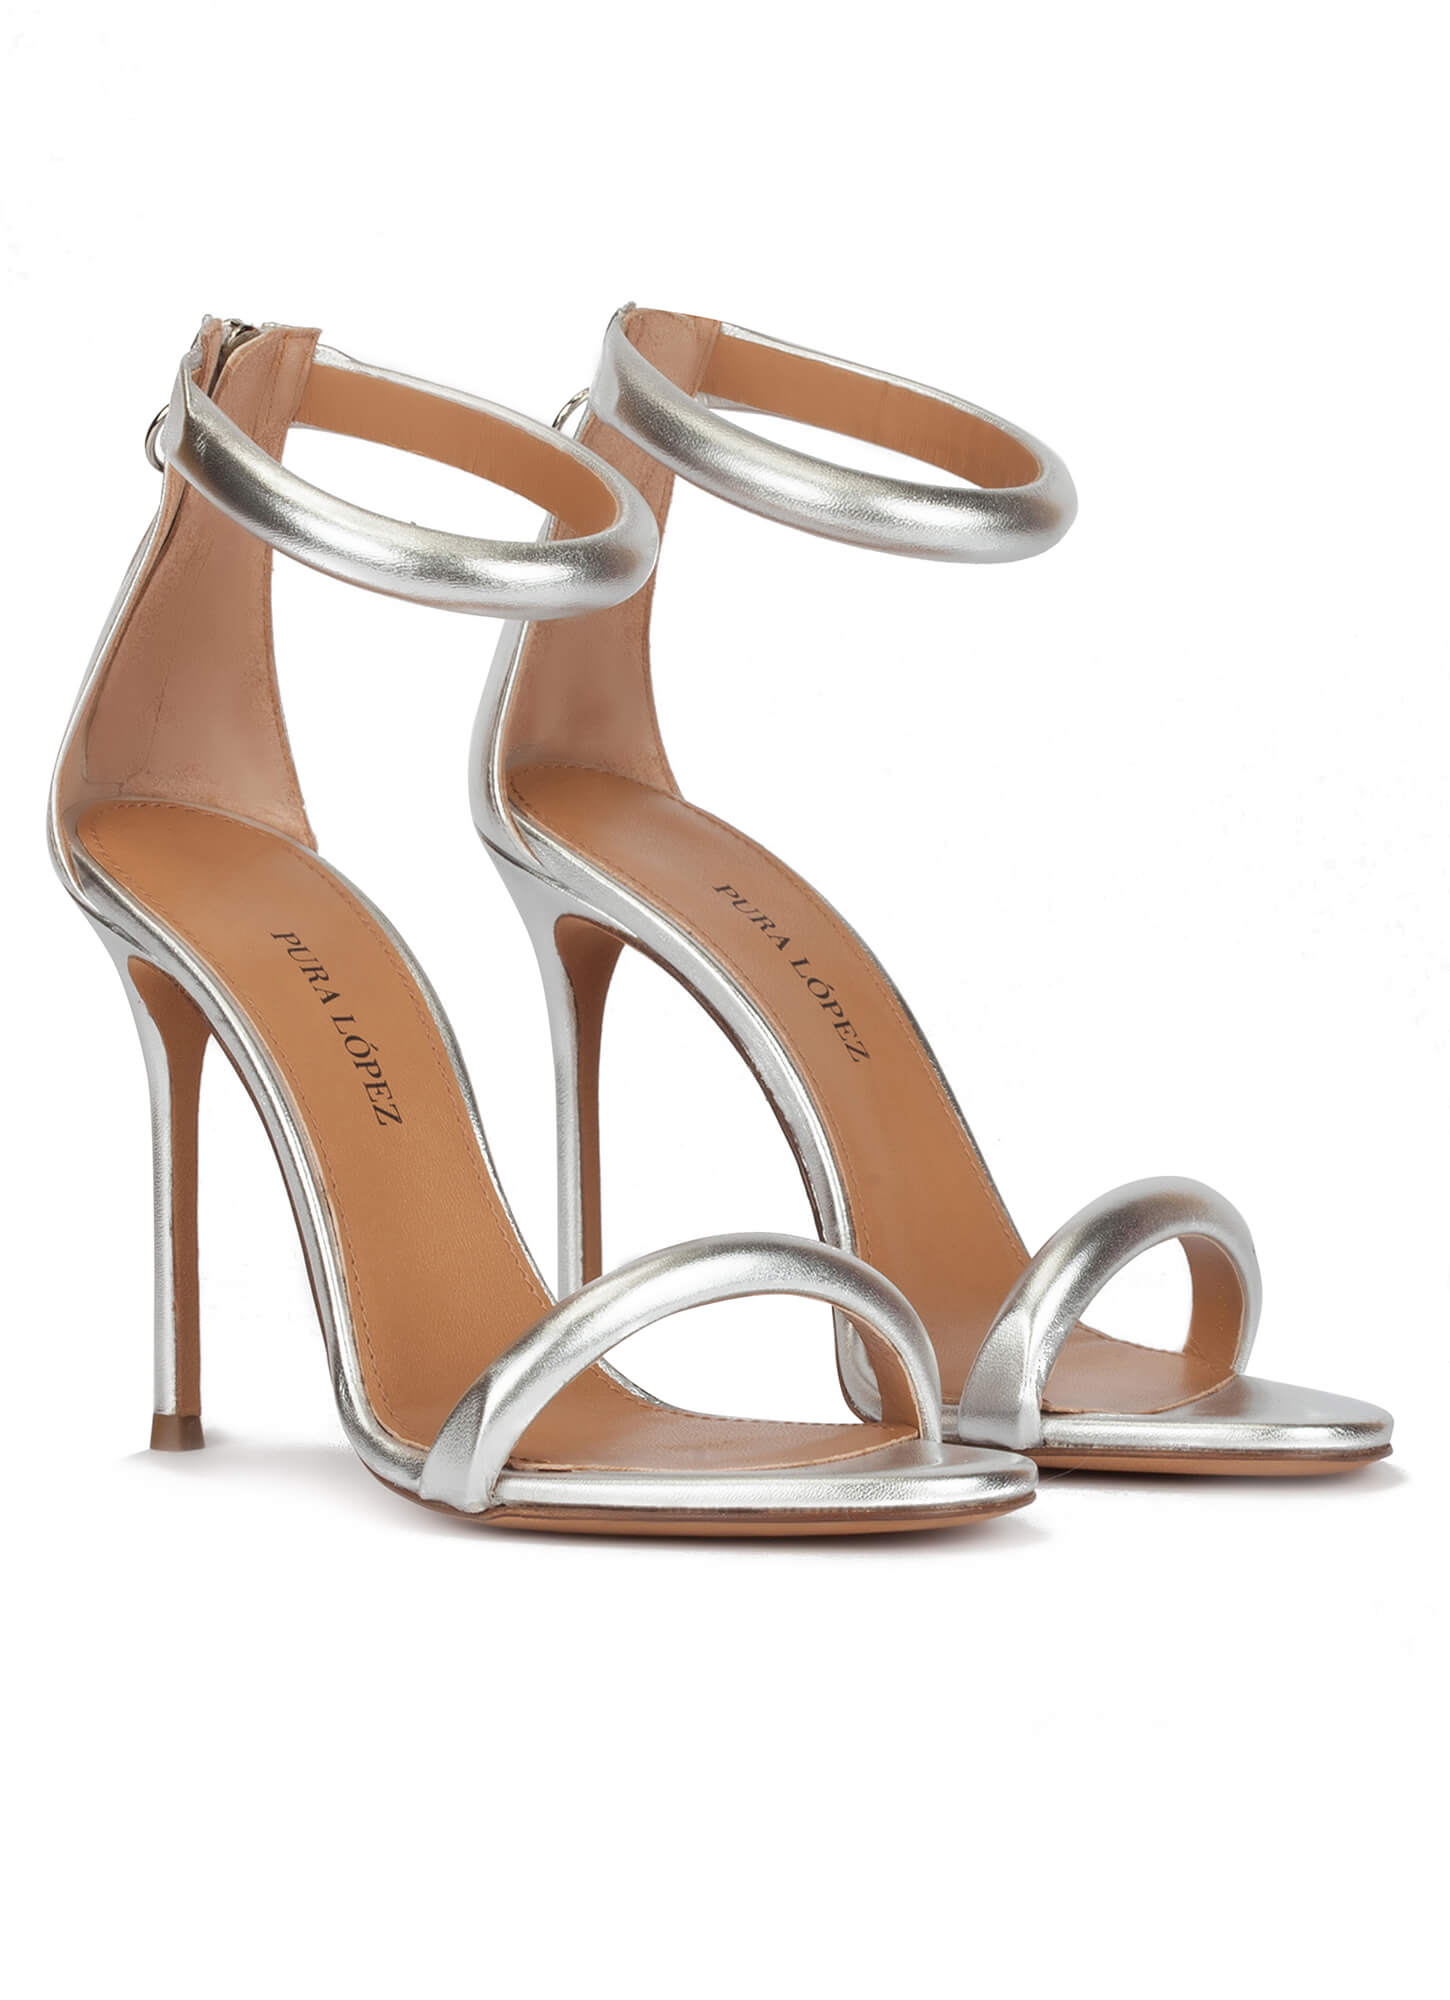 23597b5c46 Orly Pura López. Silver party high heel sandals in metallic leather Silver  party high heel sandals in metallic leather ...